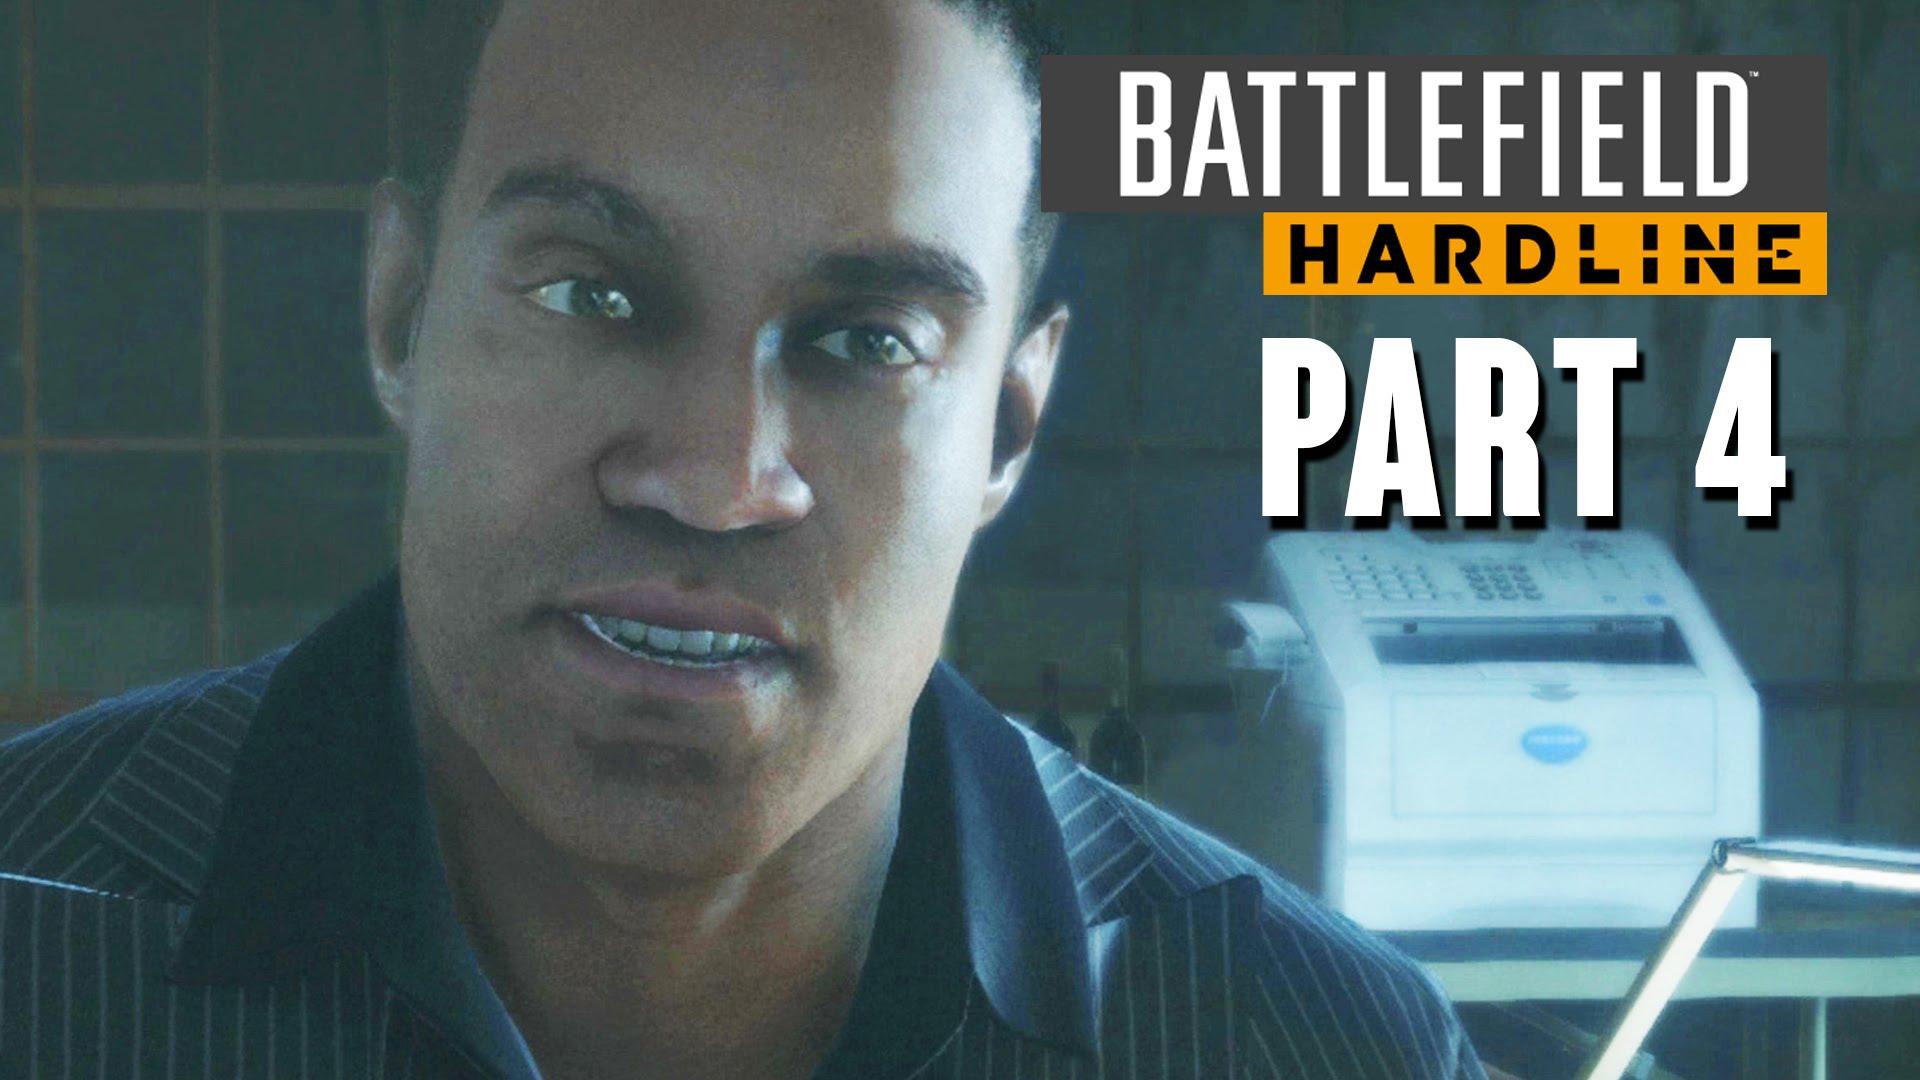 بتلفیلد هاردلاین مرحله4 - Battlefield Hardline-PC Part4